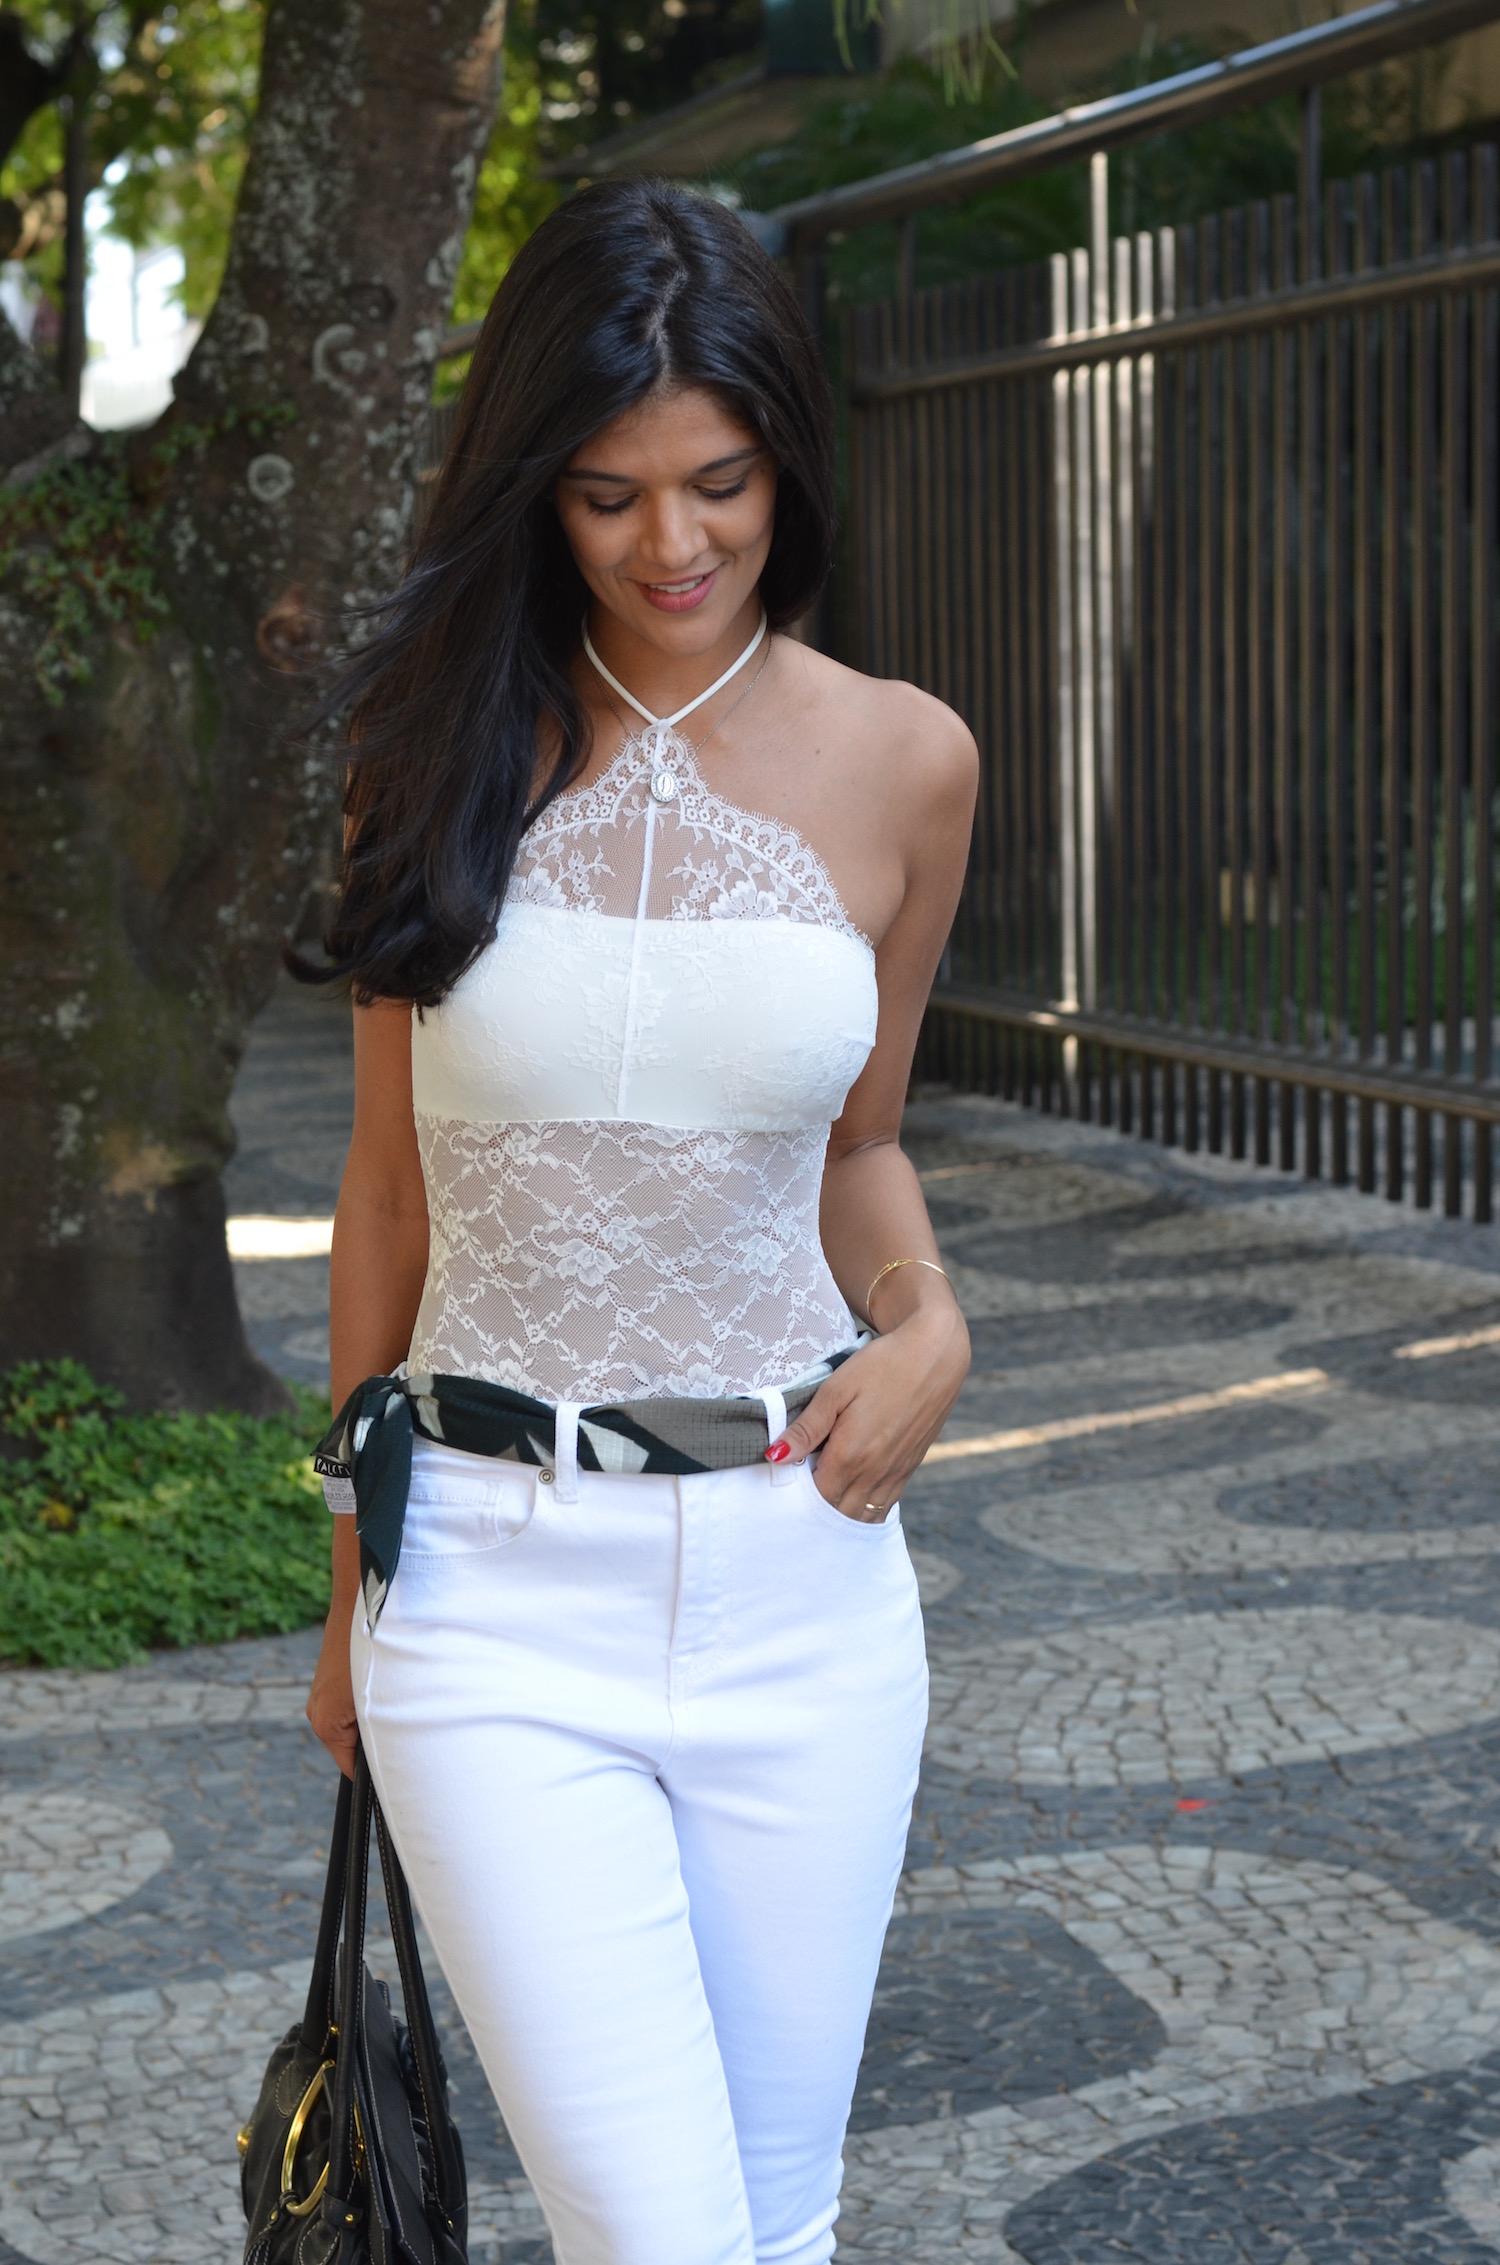 look-do-dia-branco-body-roberta-beta-pinheiro-blogueira-rio-dejaneiro-9